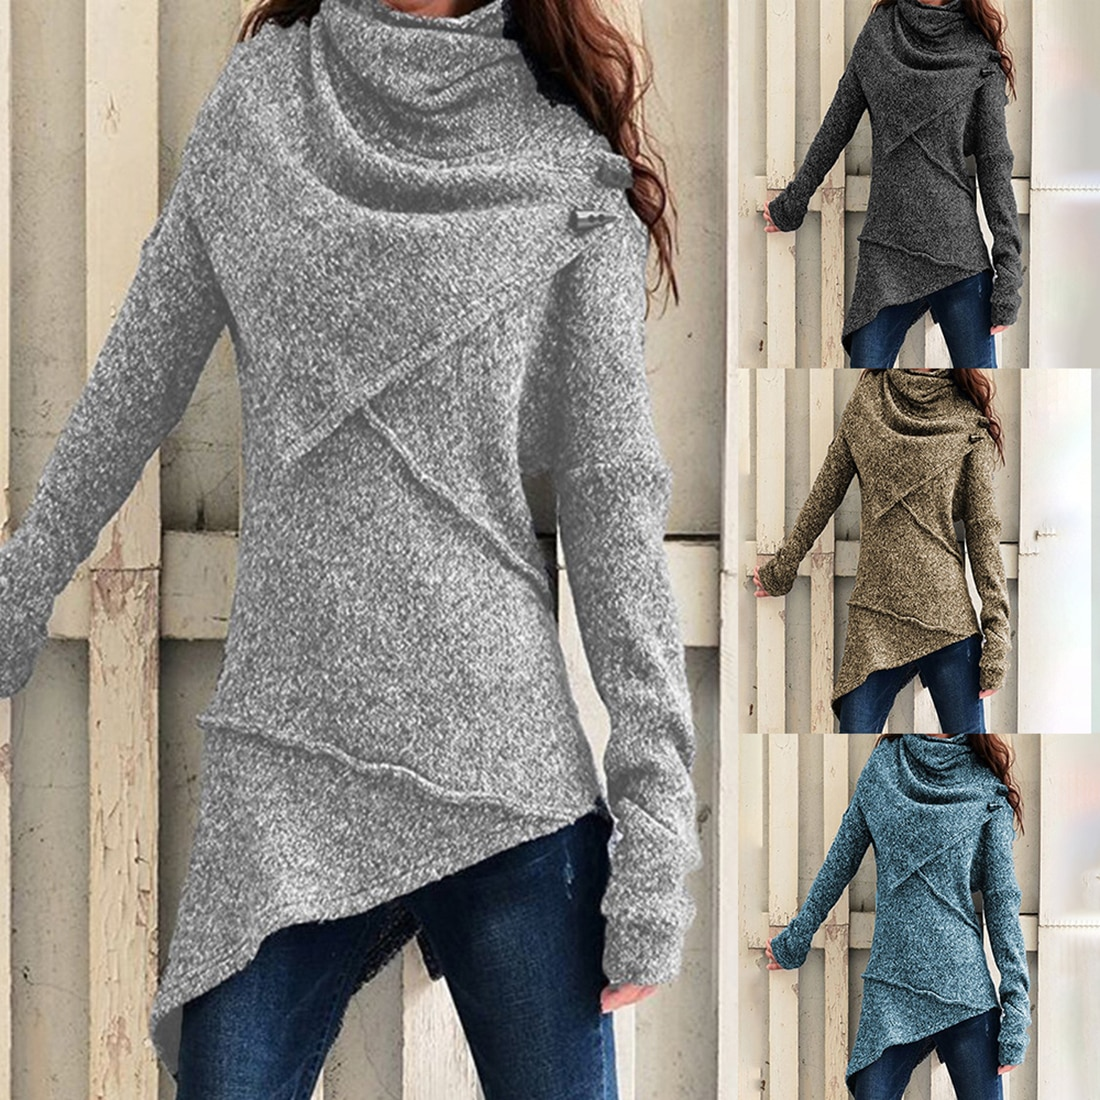 Malhas camisola de gola alta feminina outono inverno manga comprida jumpers moda irregular casual fino pulôver